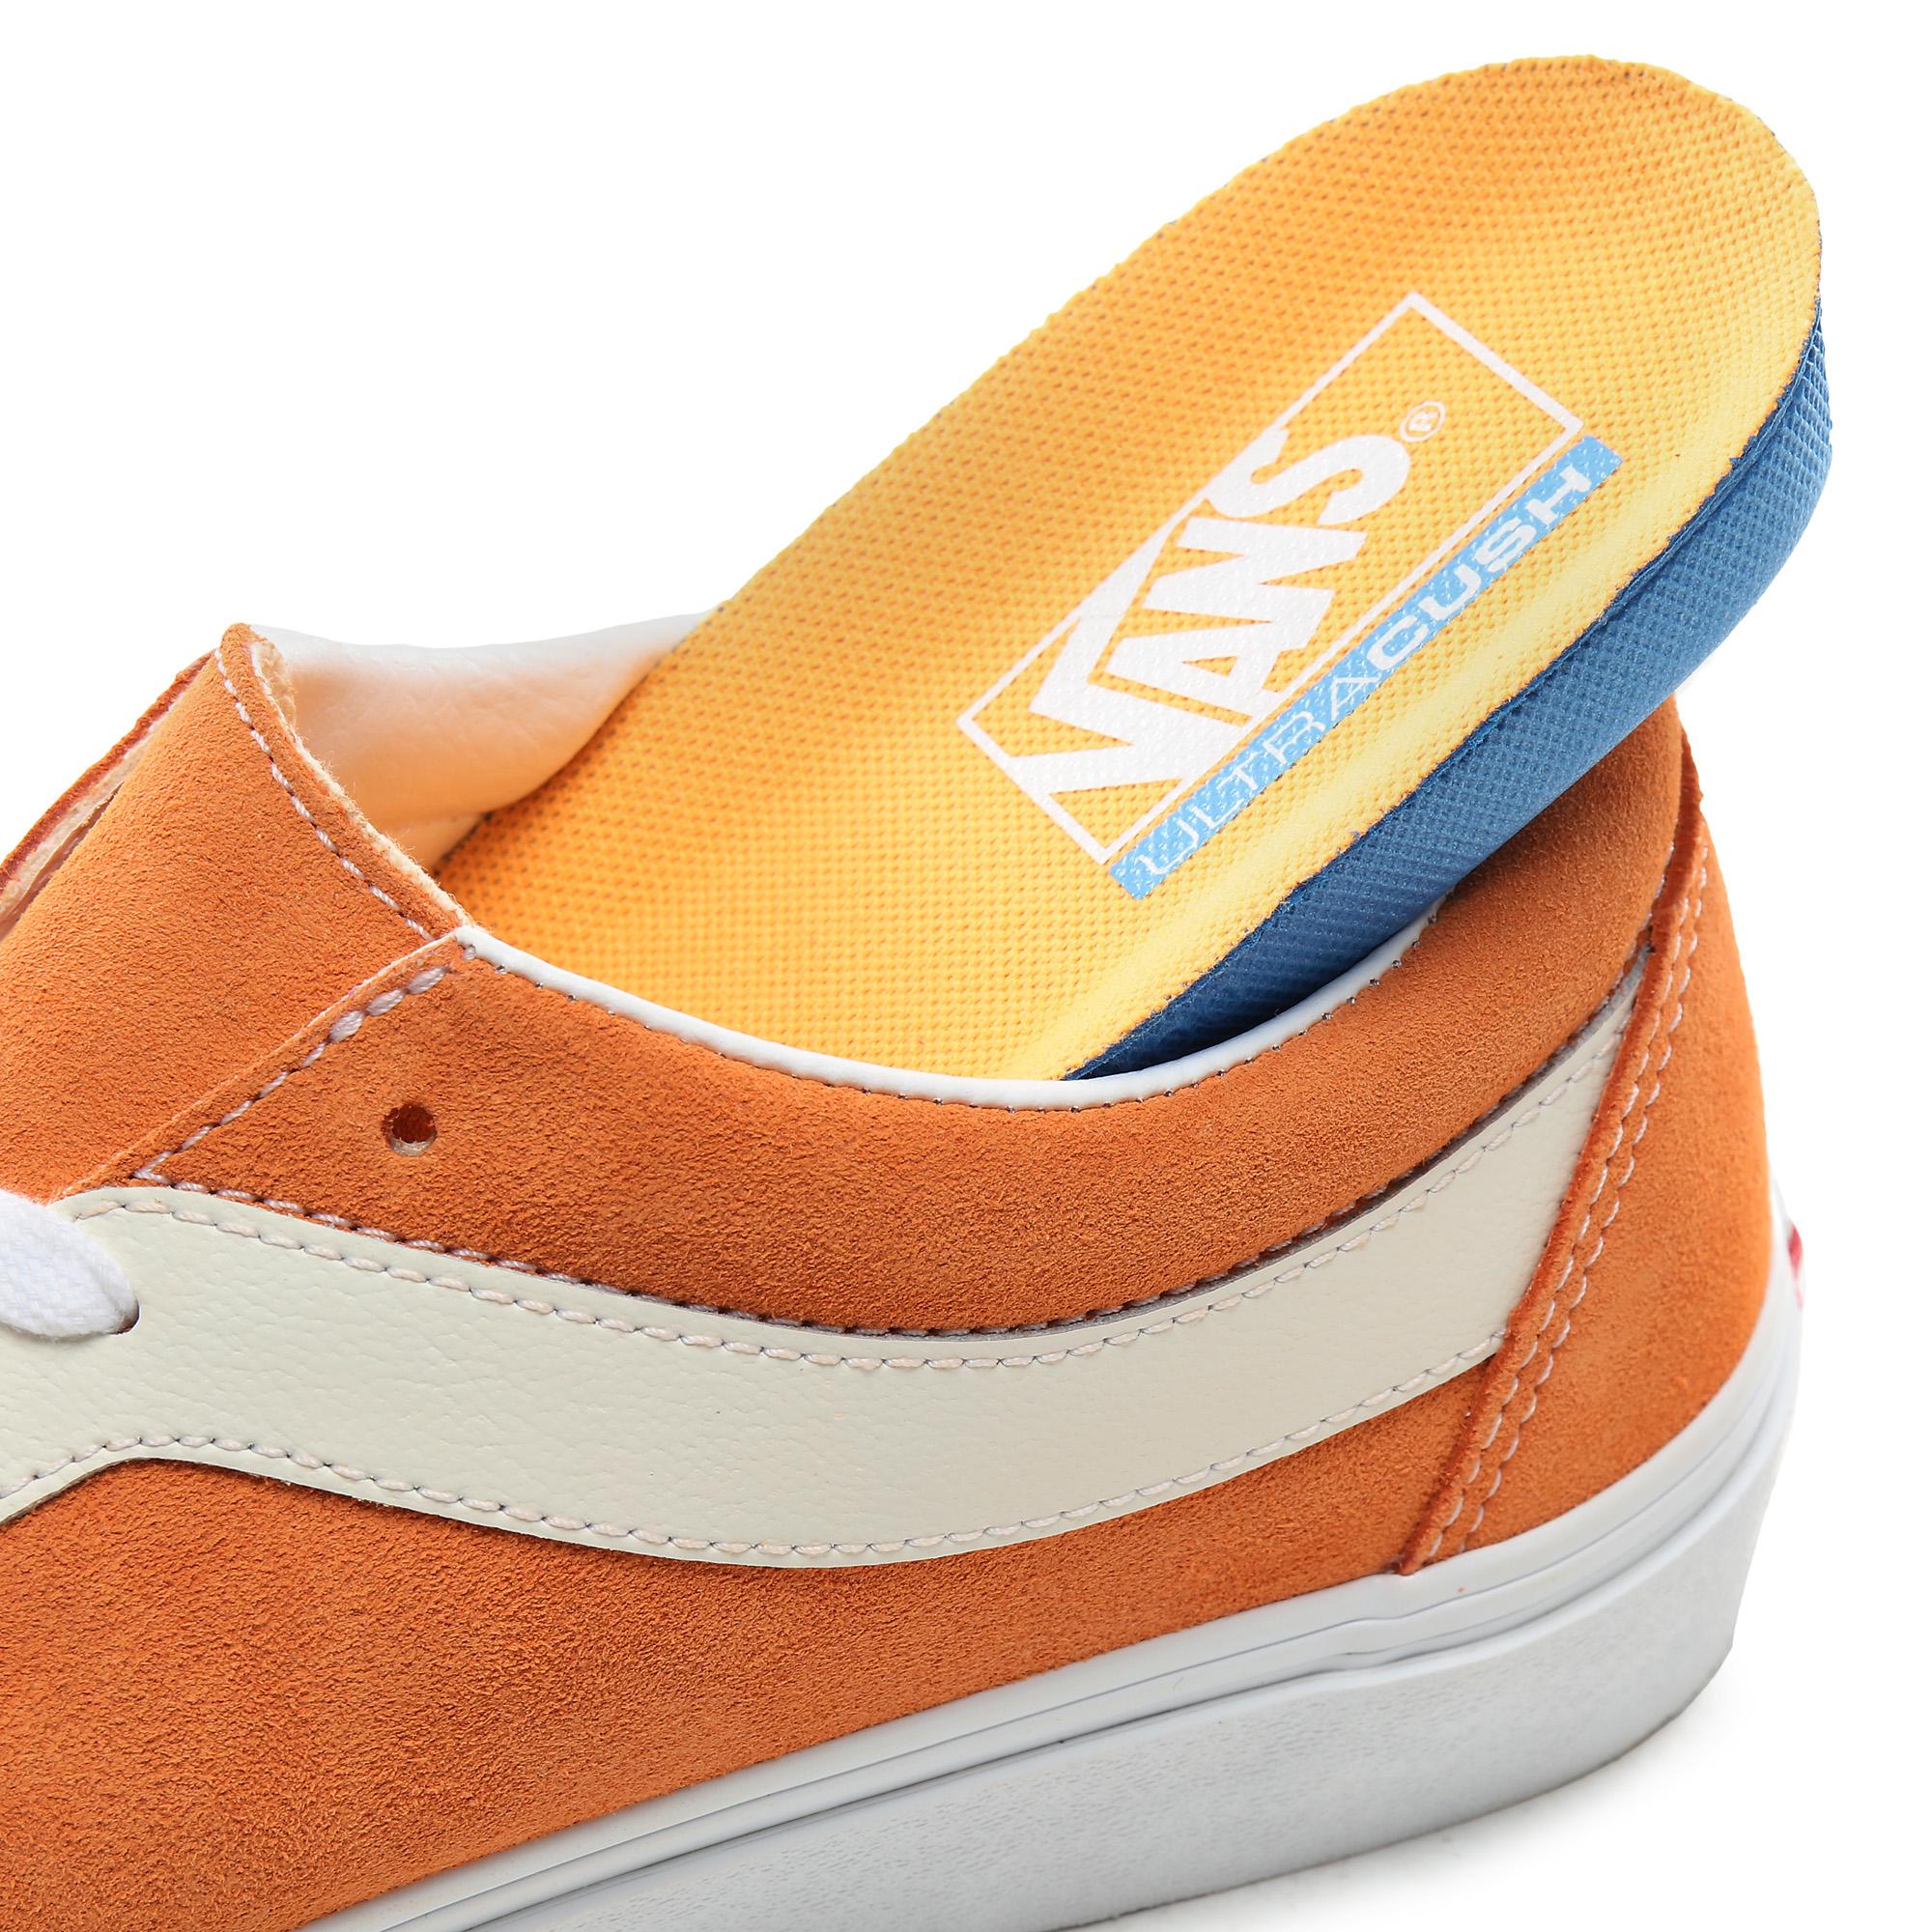 Фото 7 - Кеды Bold Ni оранжевого цвета